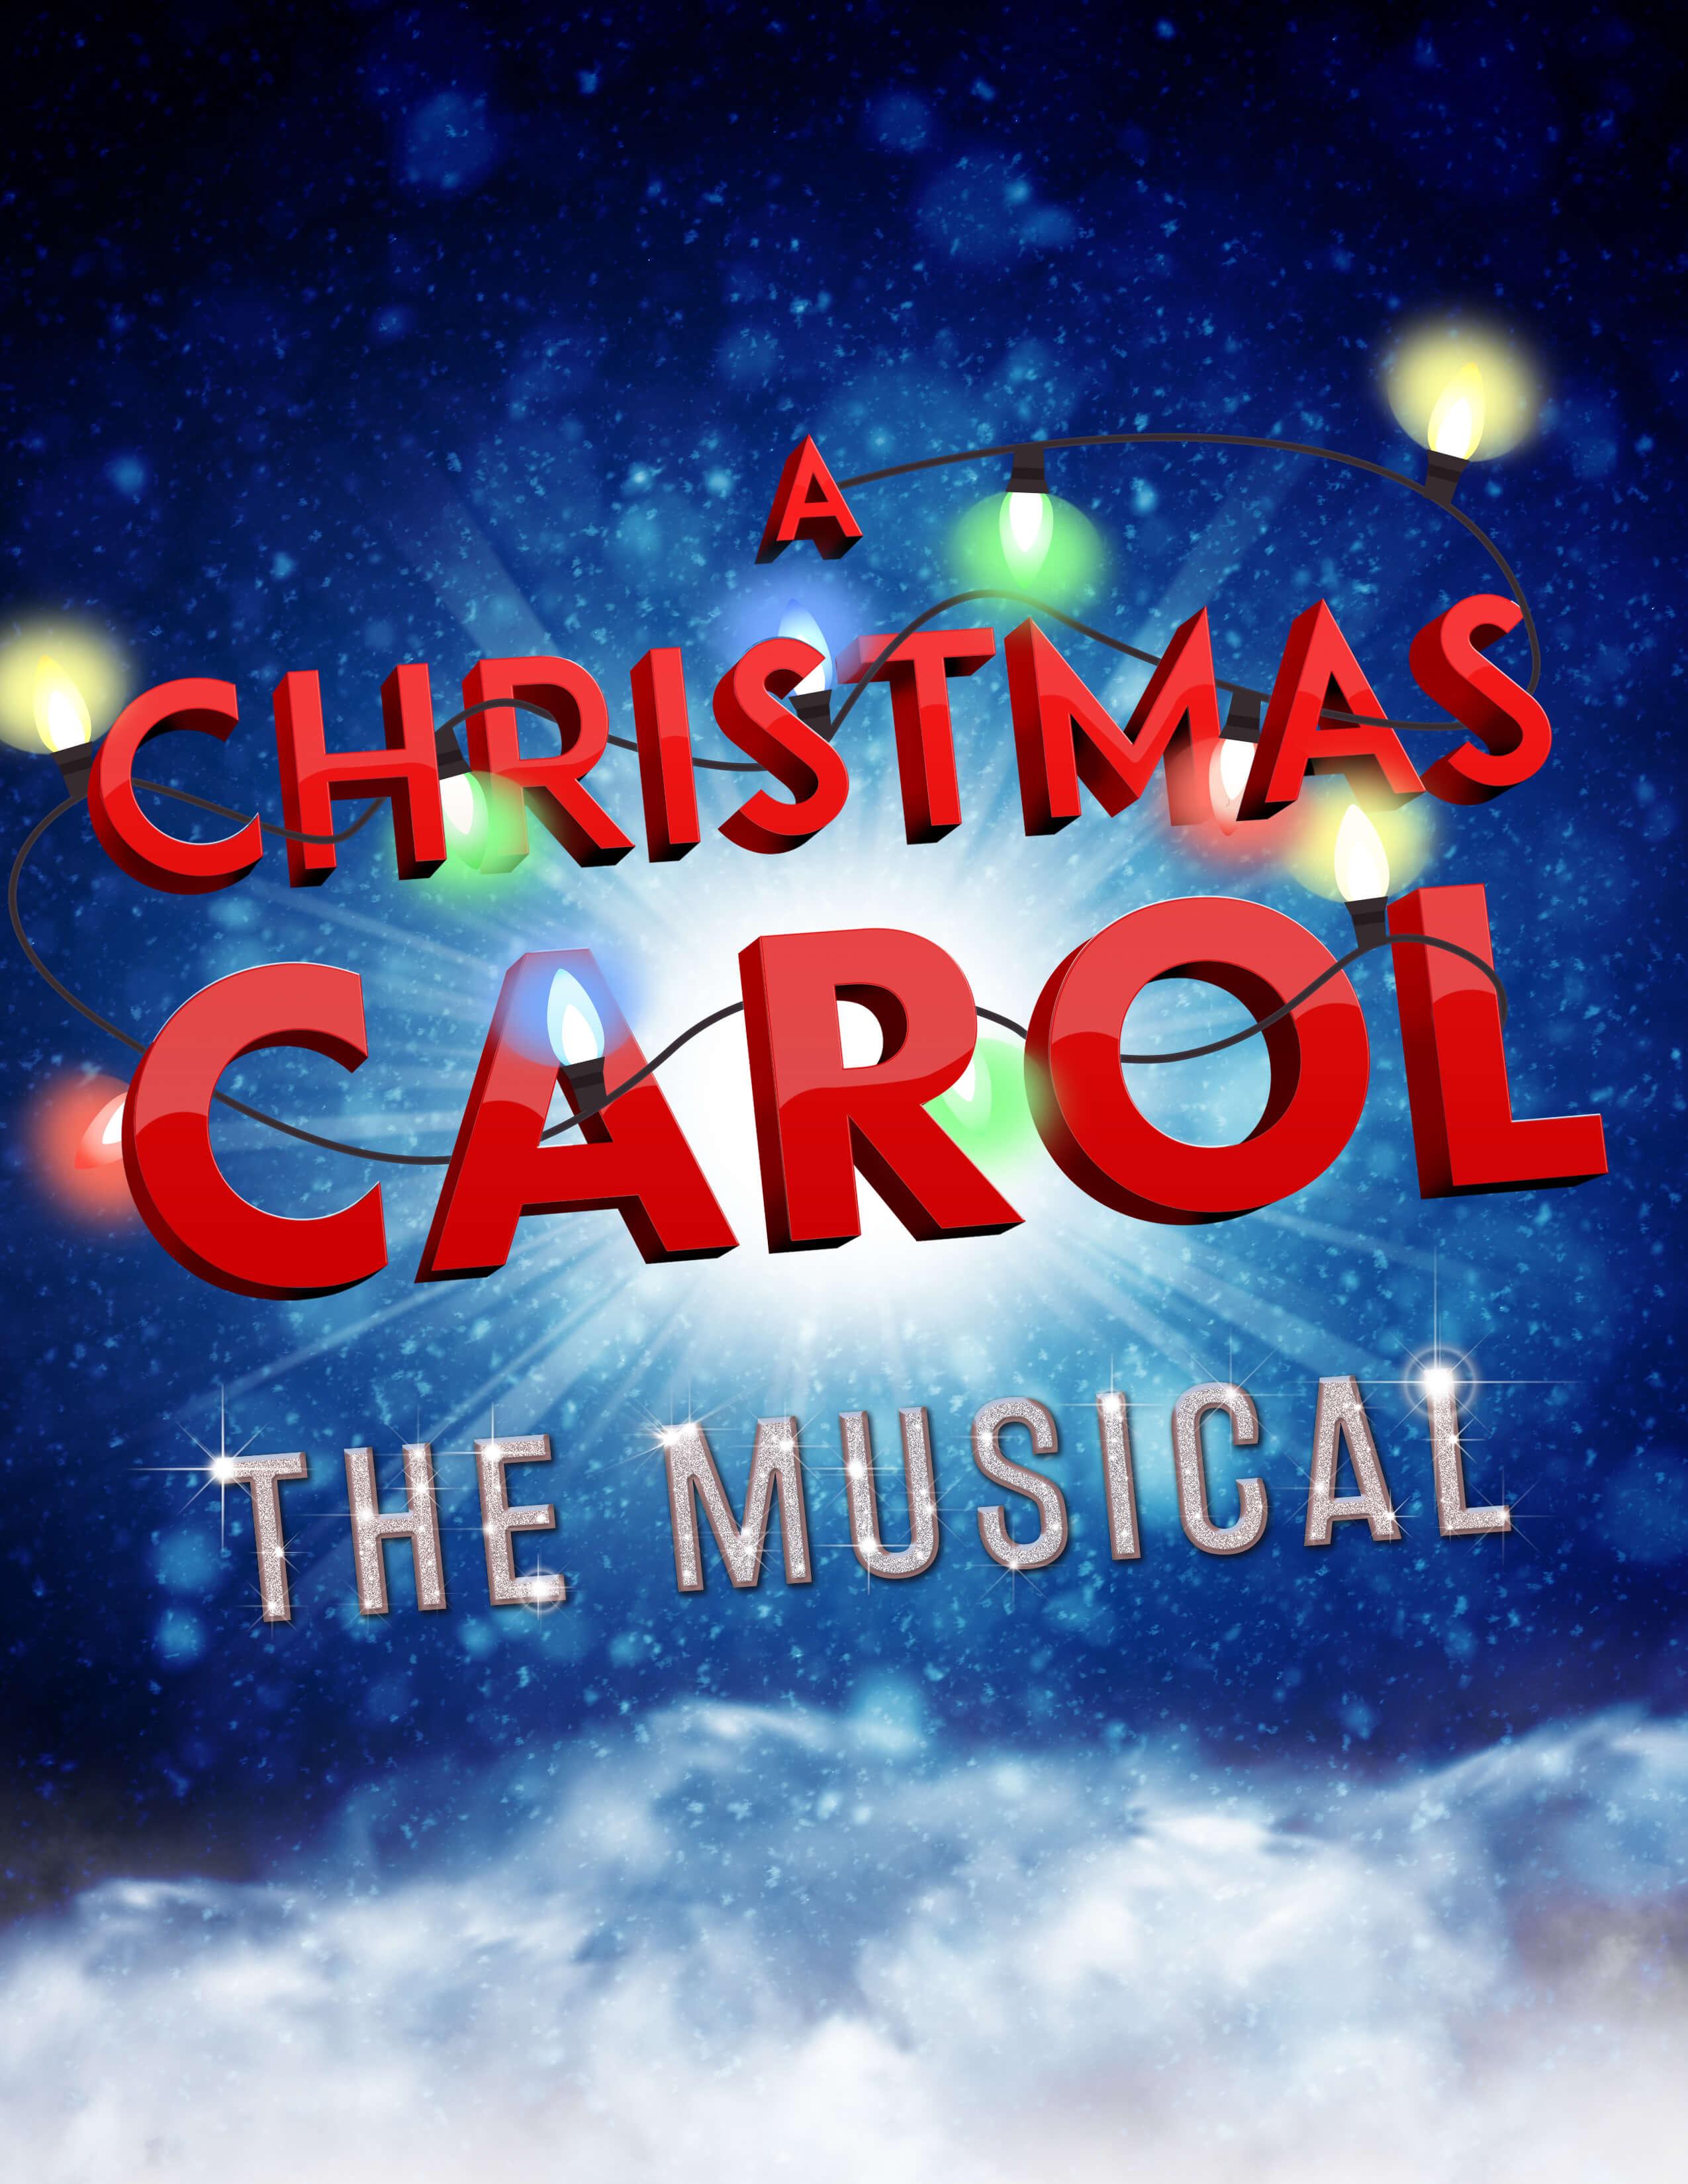 A CHRISTMAS CAROL THE MUSICAL | Derby Dinner Playhouse